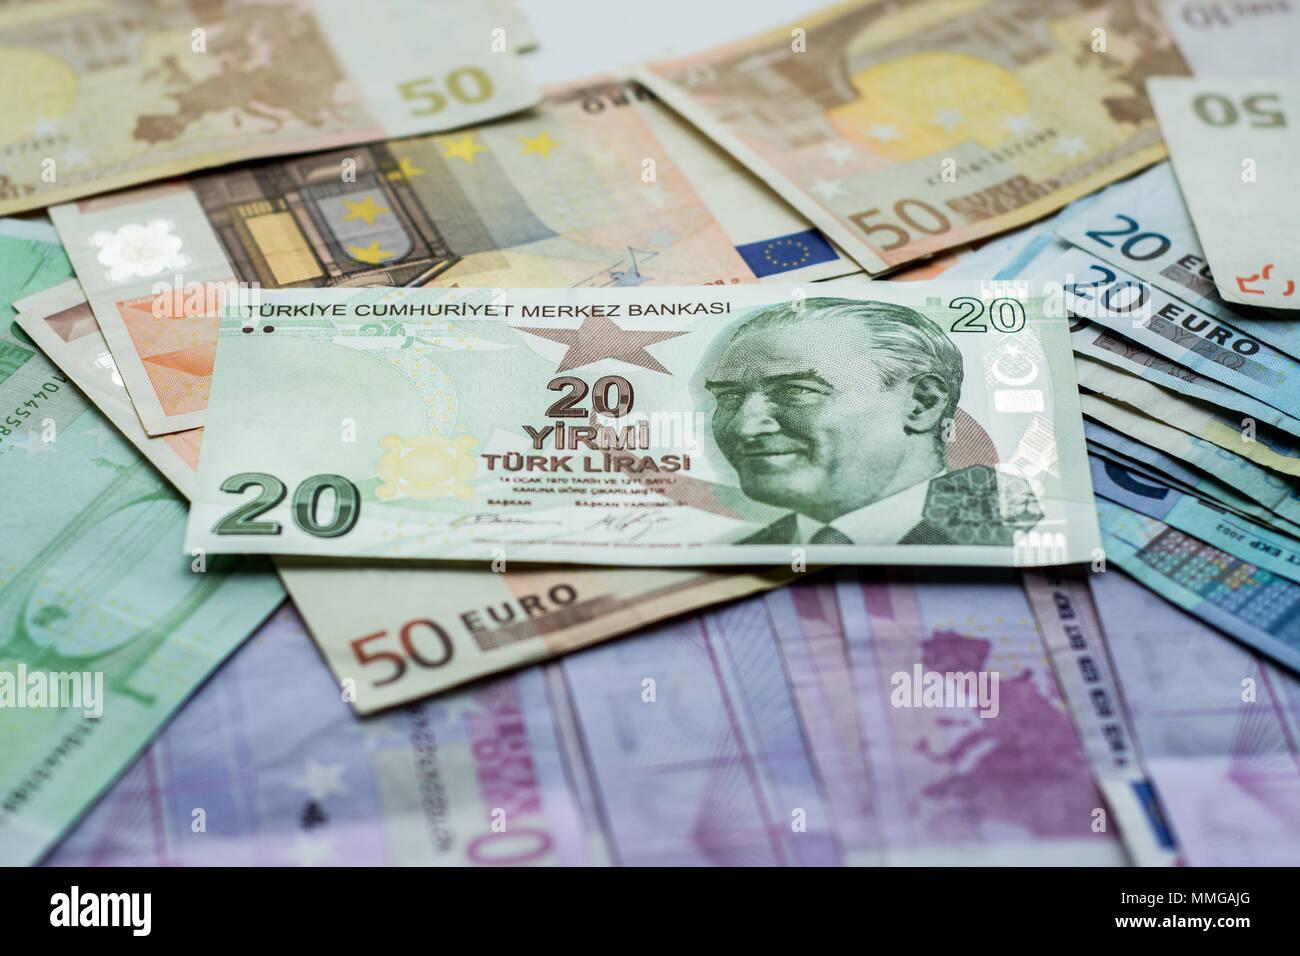 Euro lira